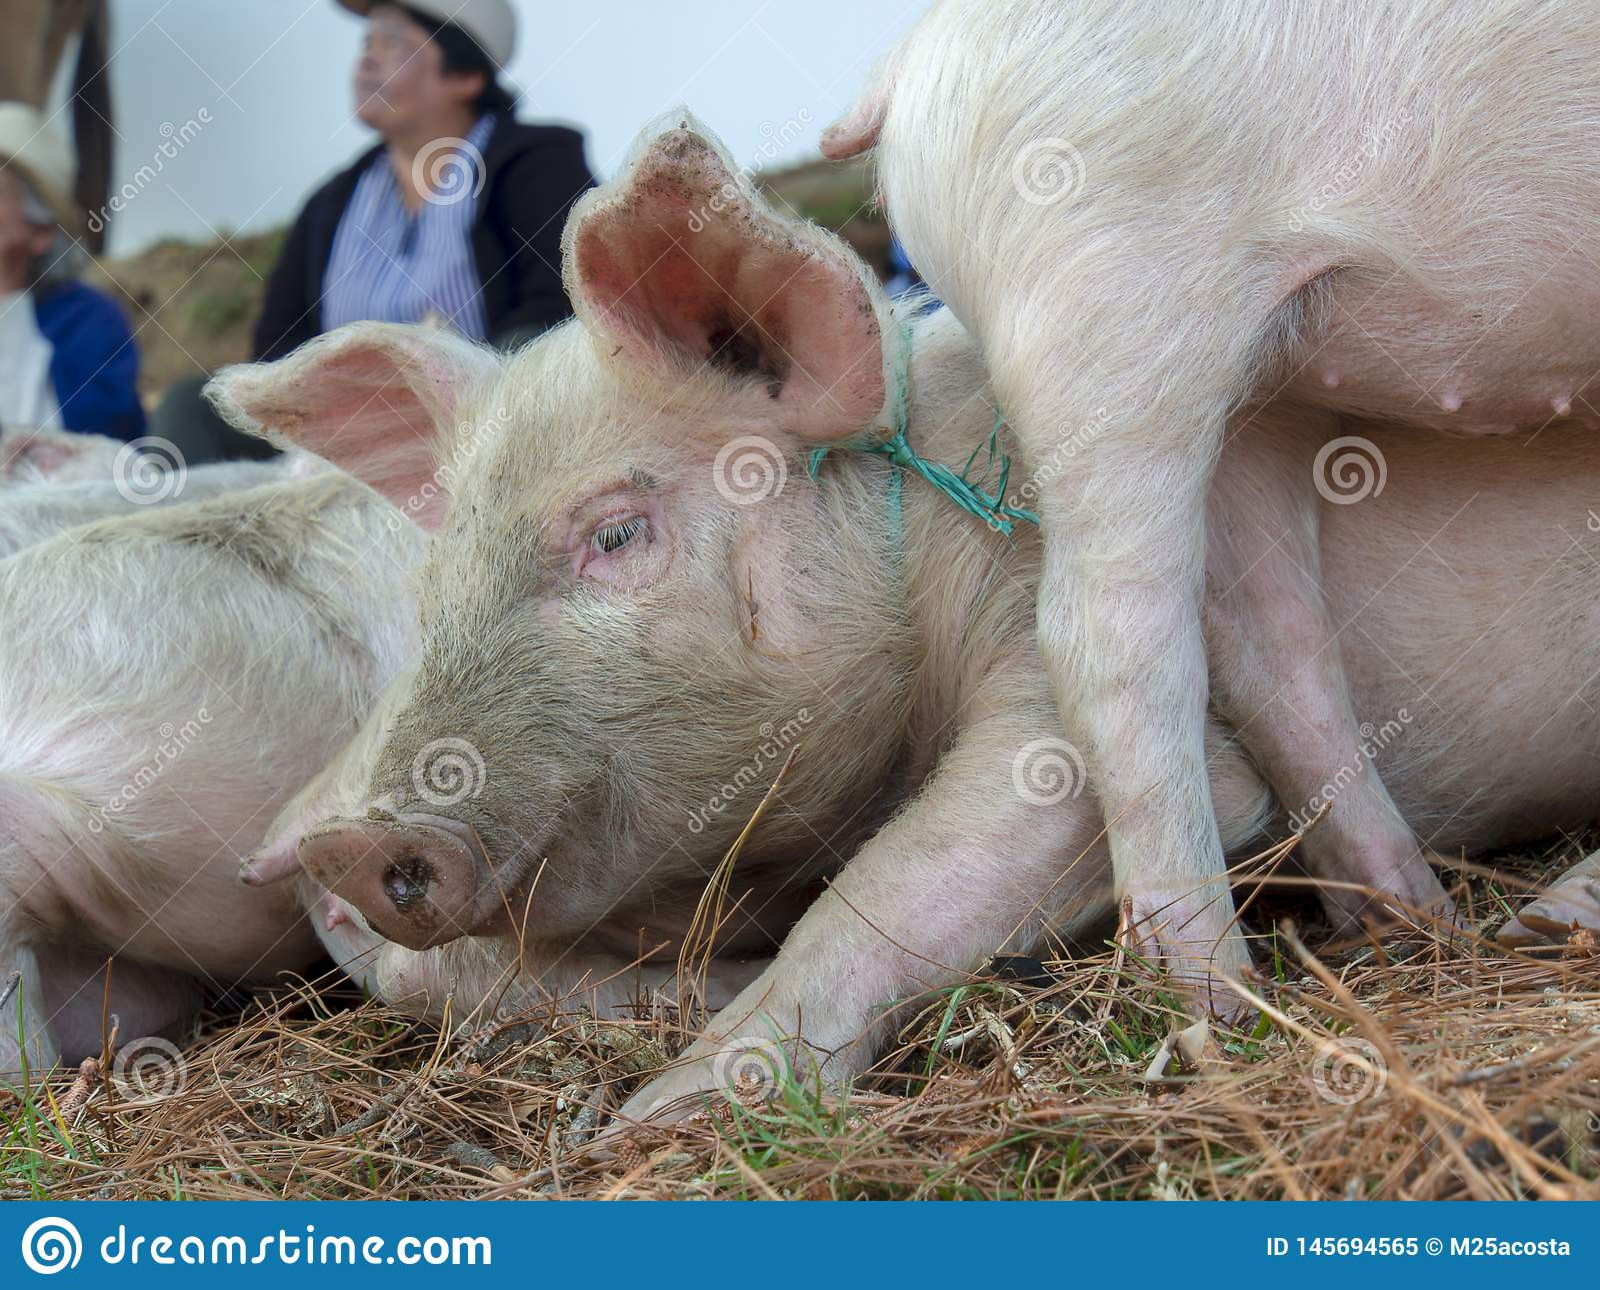 Head of a piglet in a market